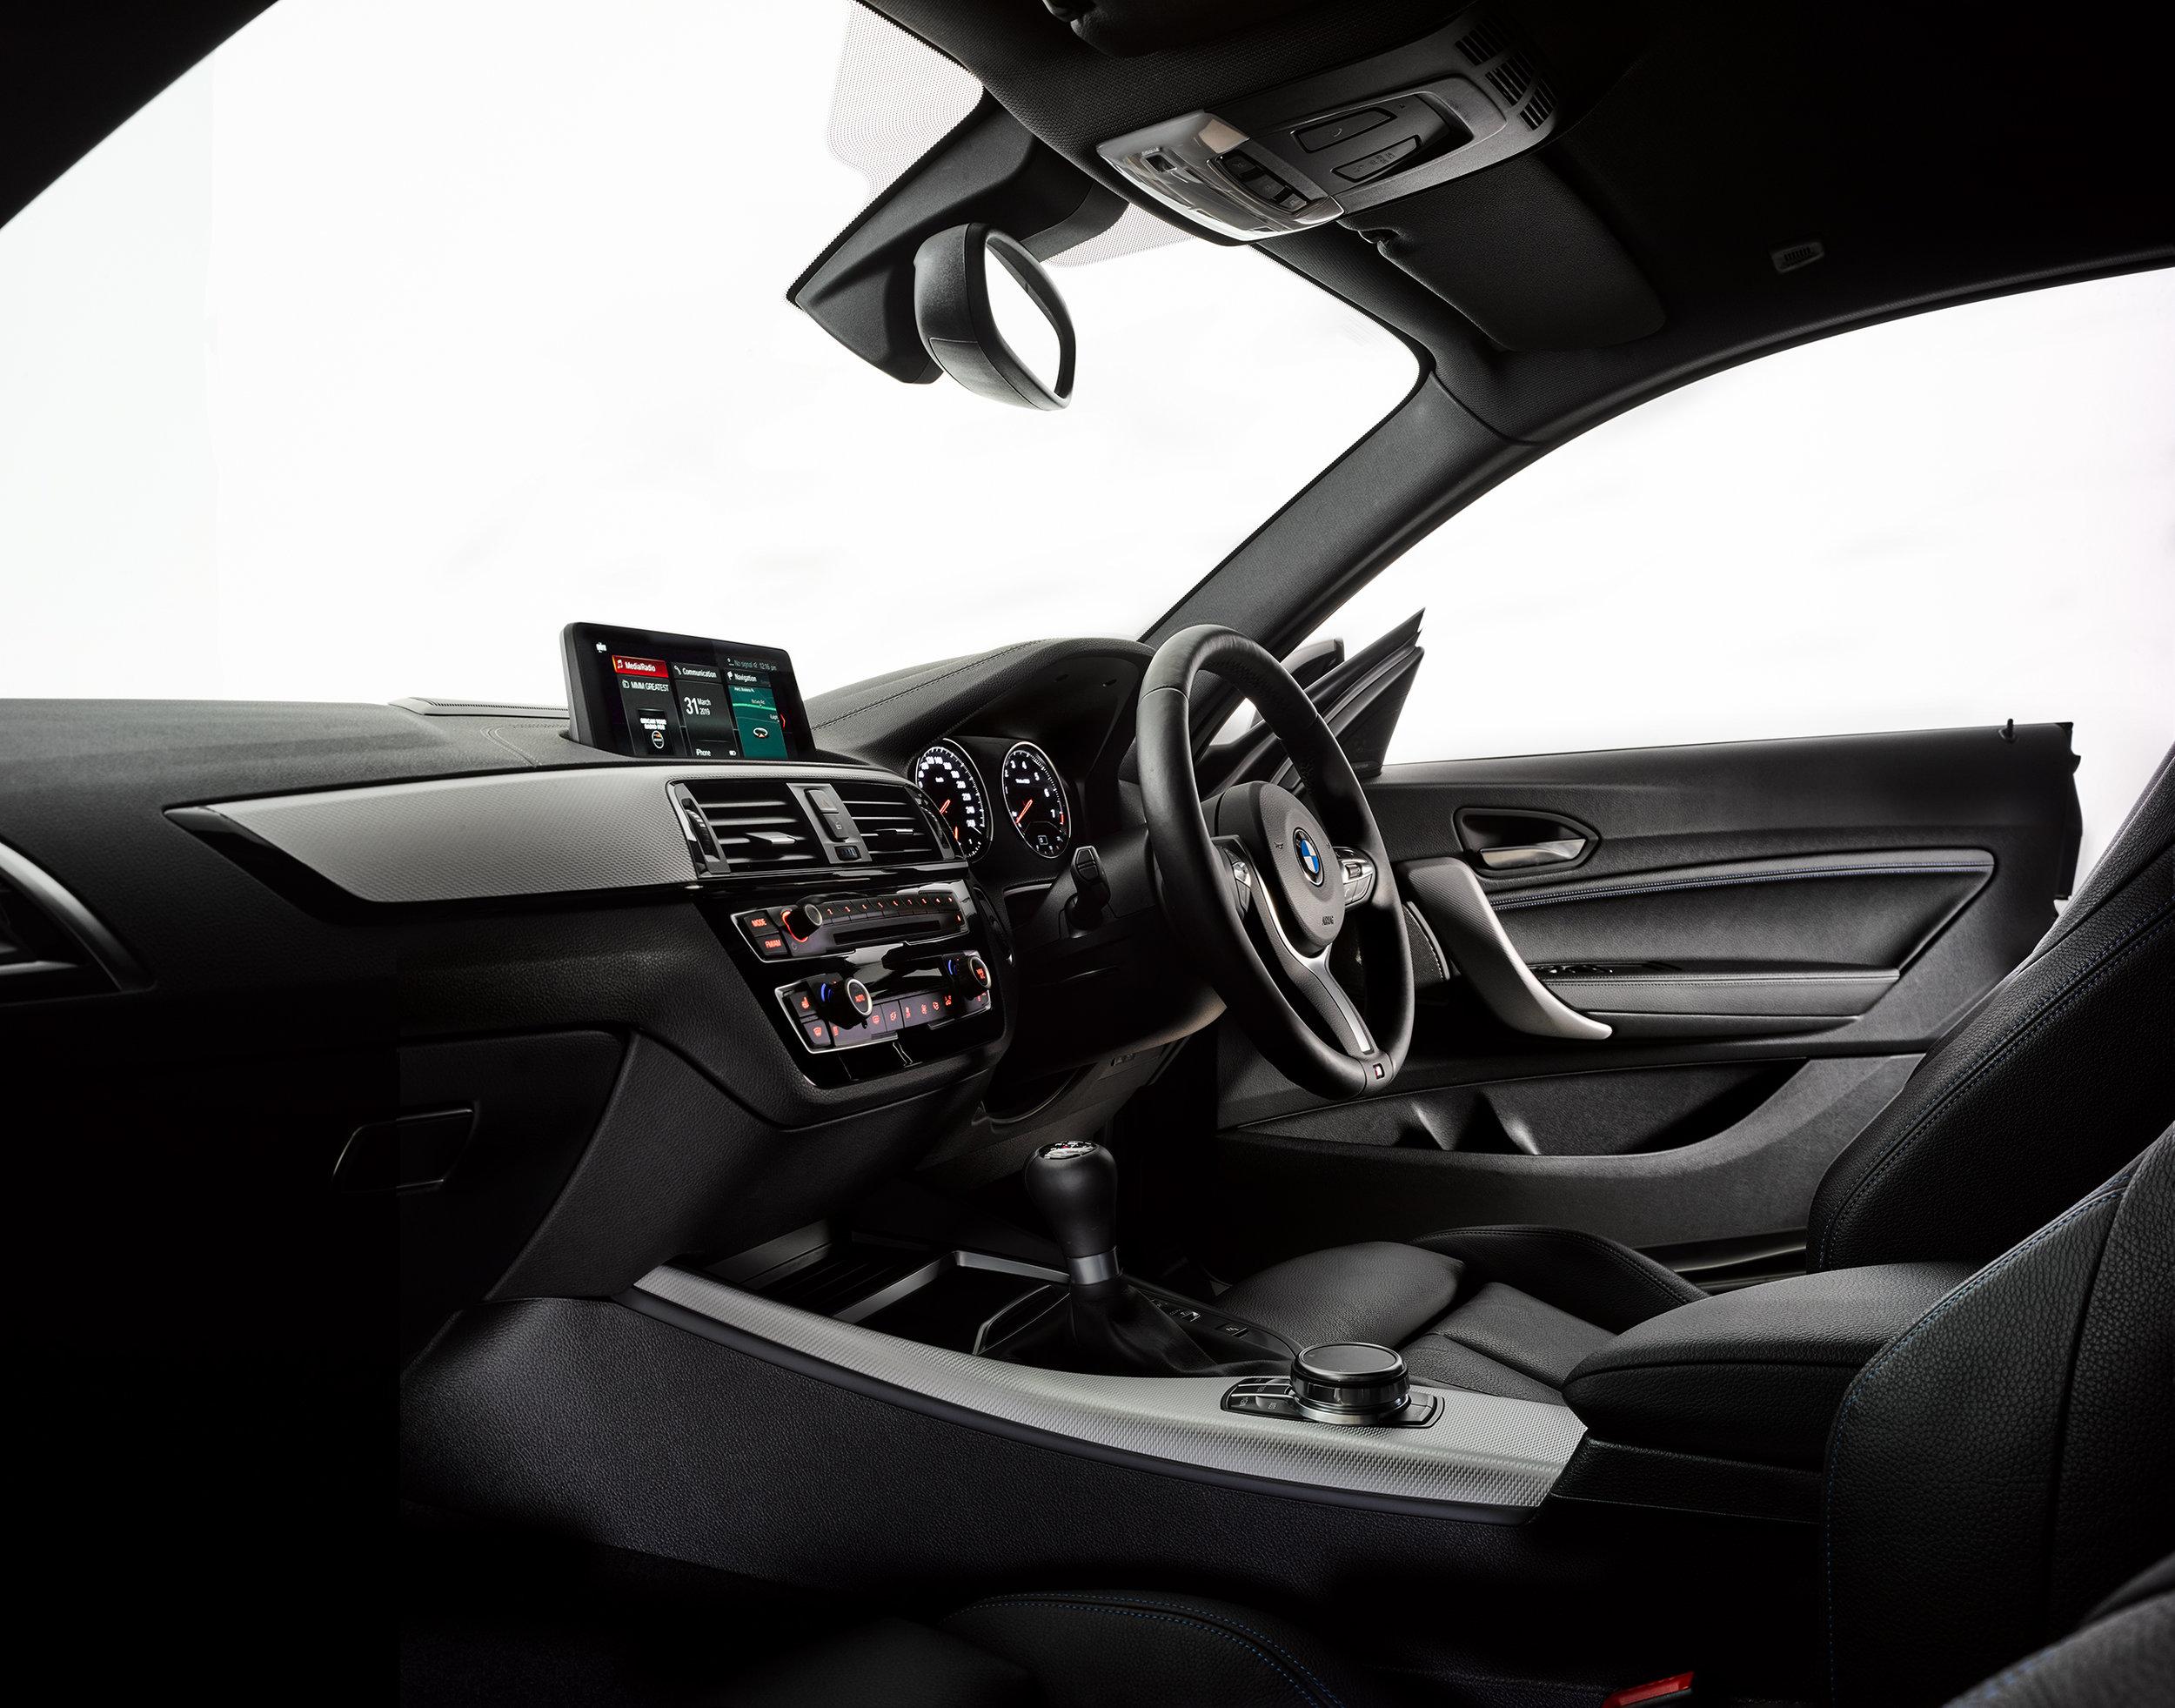 BMW02-test-edit-02-copy.jpg